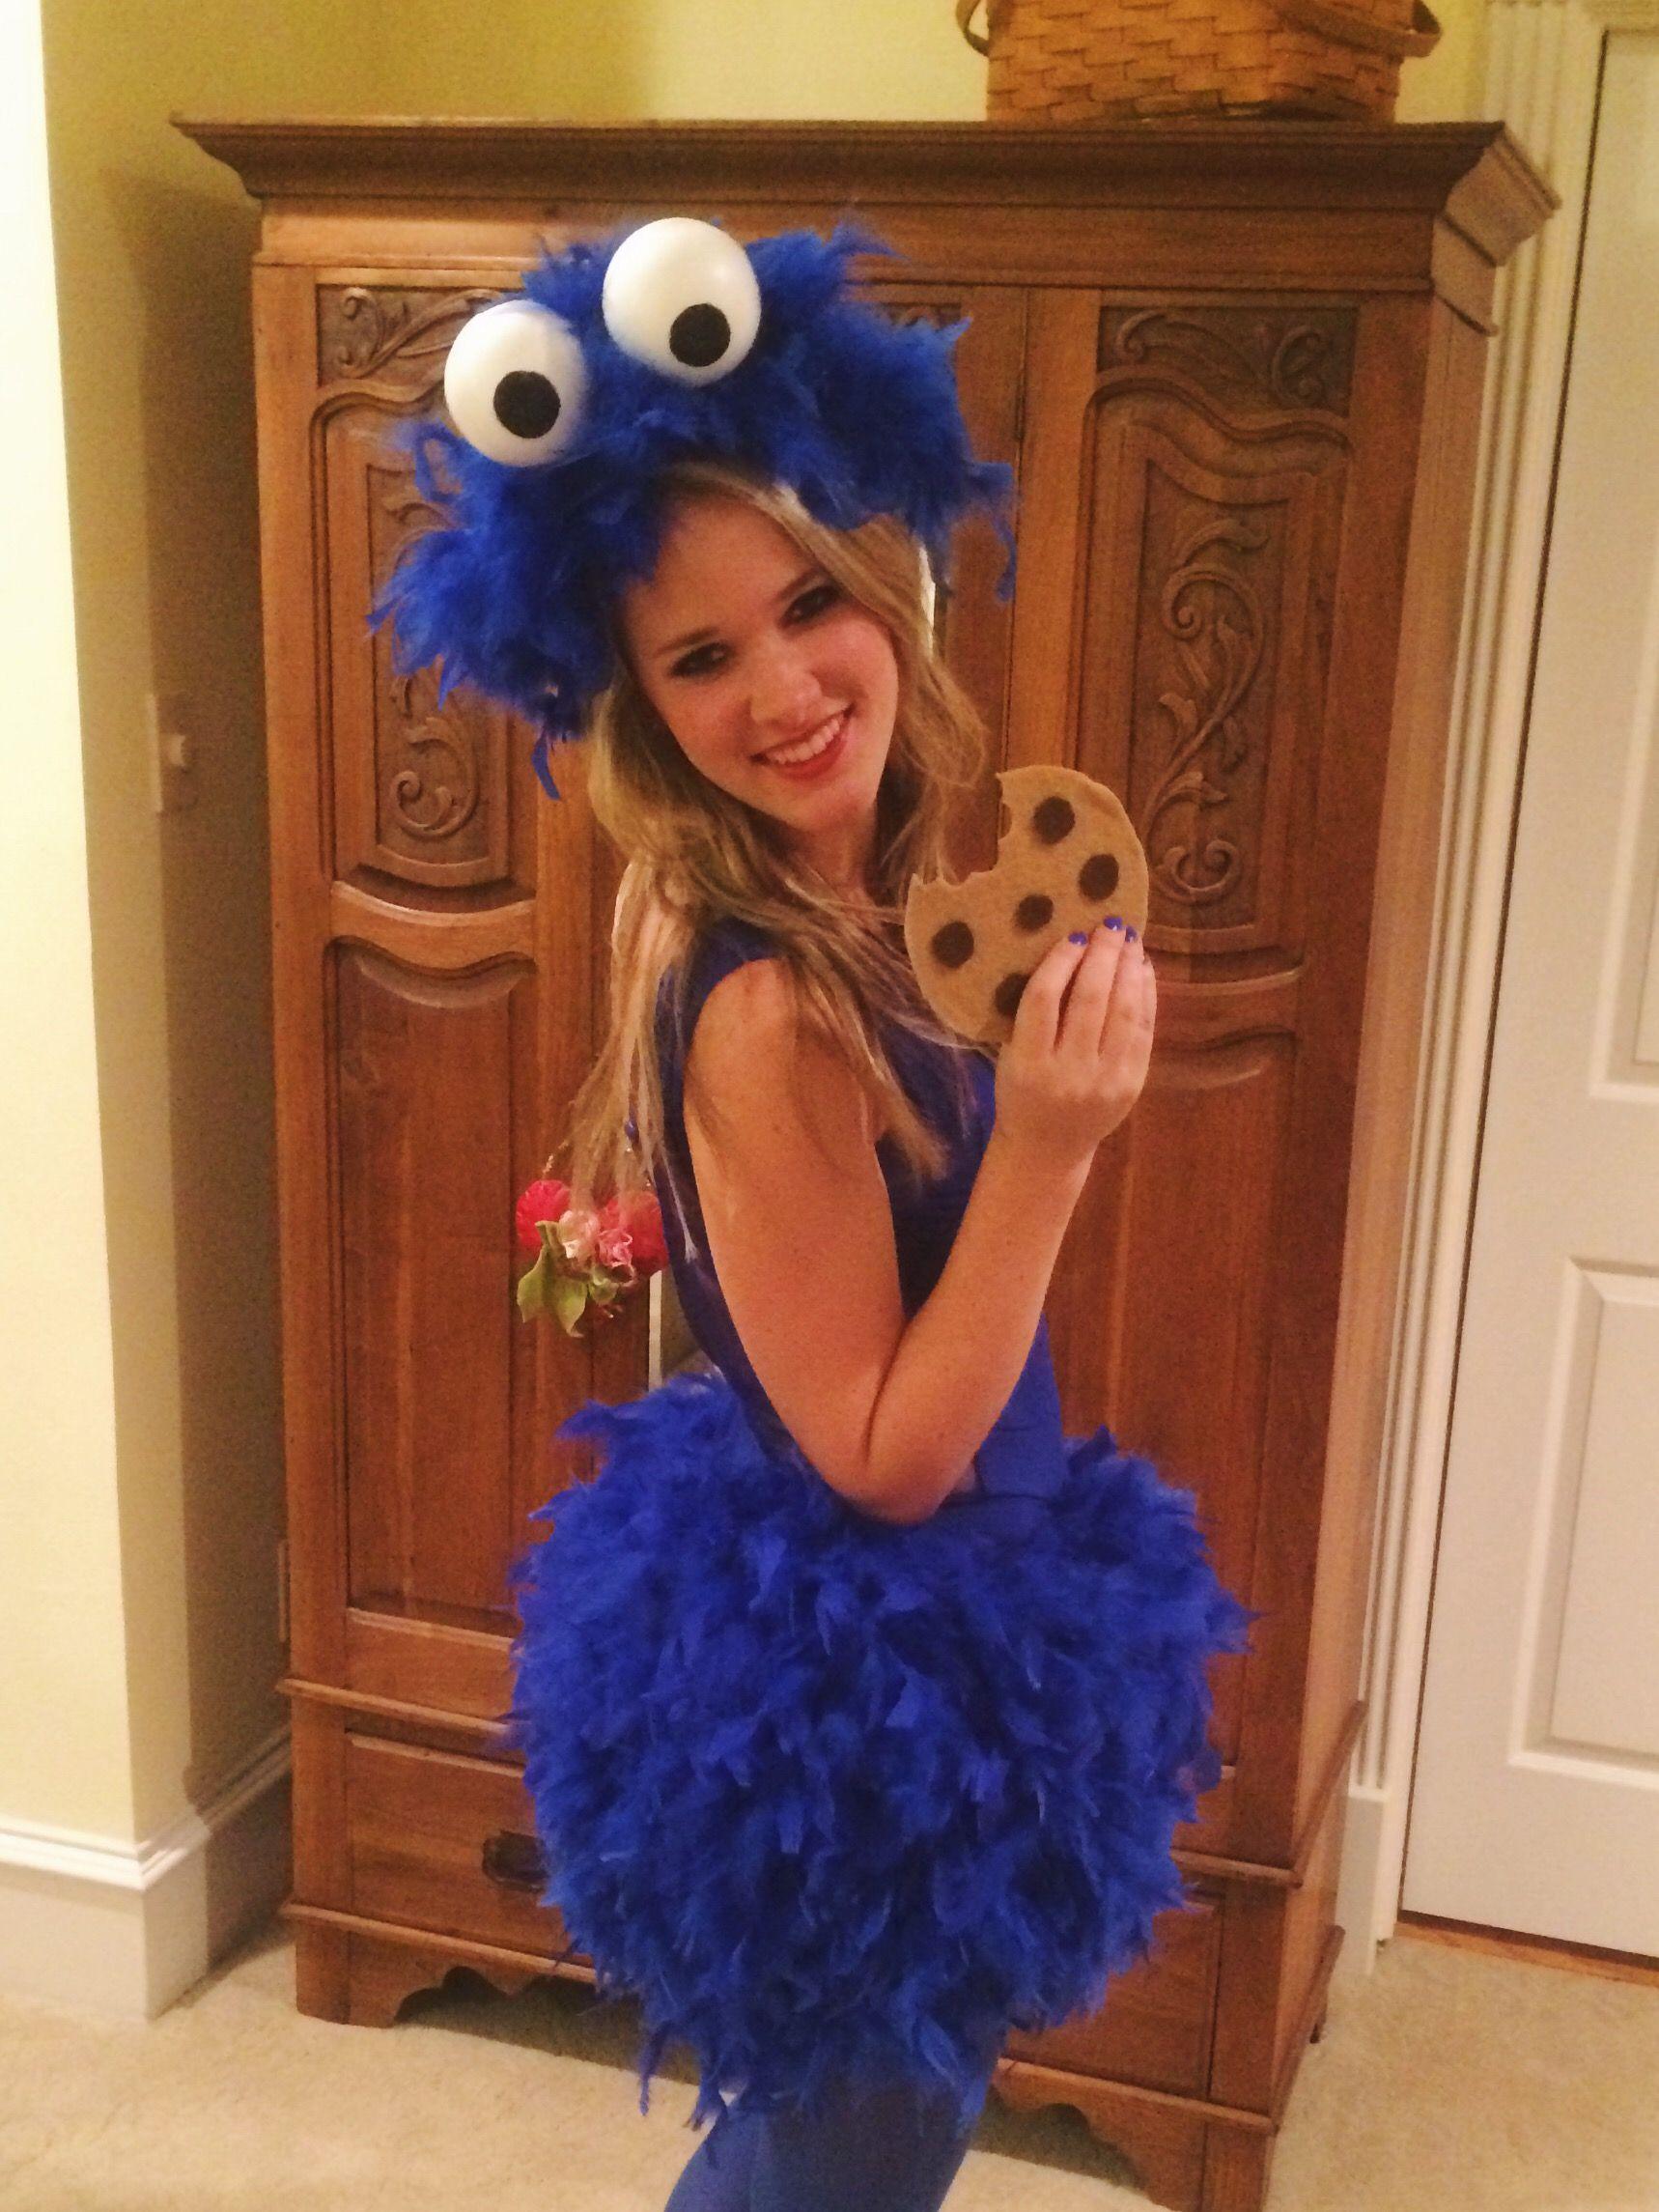 Cookie Monster Kostuem.Diy Cookie Monster Costume Cookie Monster Costume Monster Costumes Cookie Monster Halloween Costume